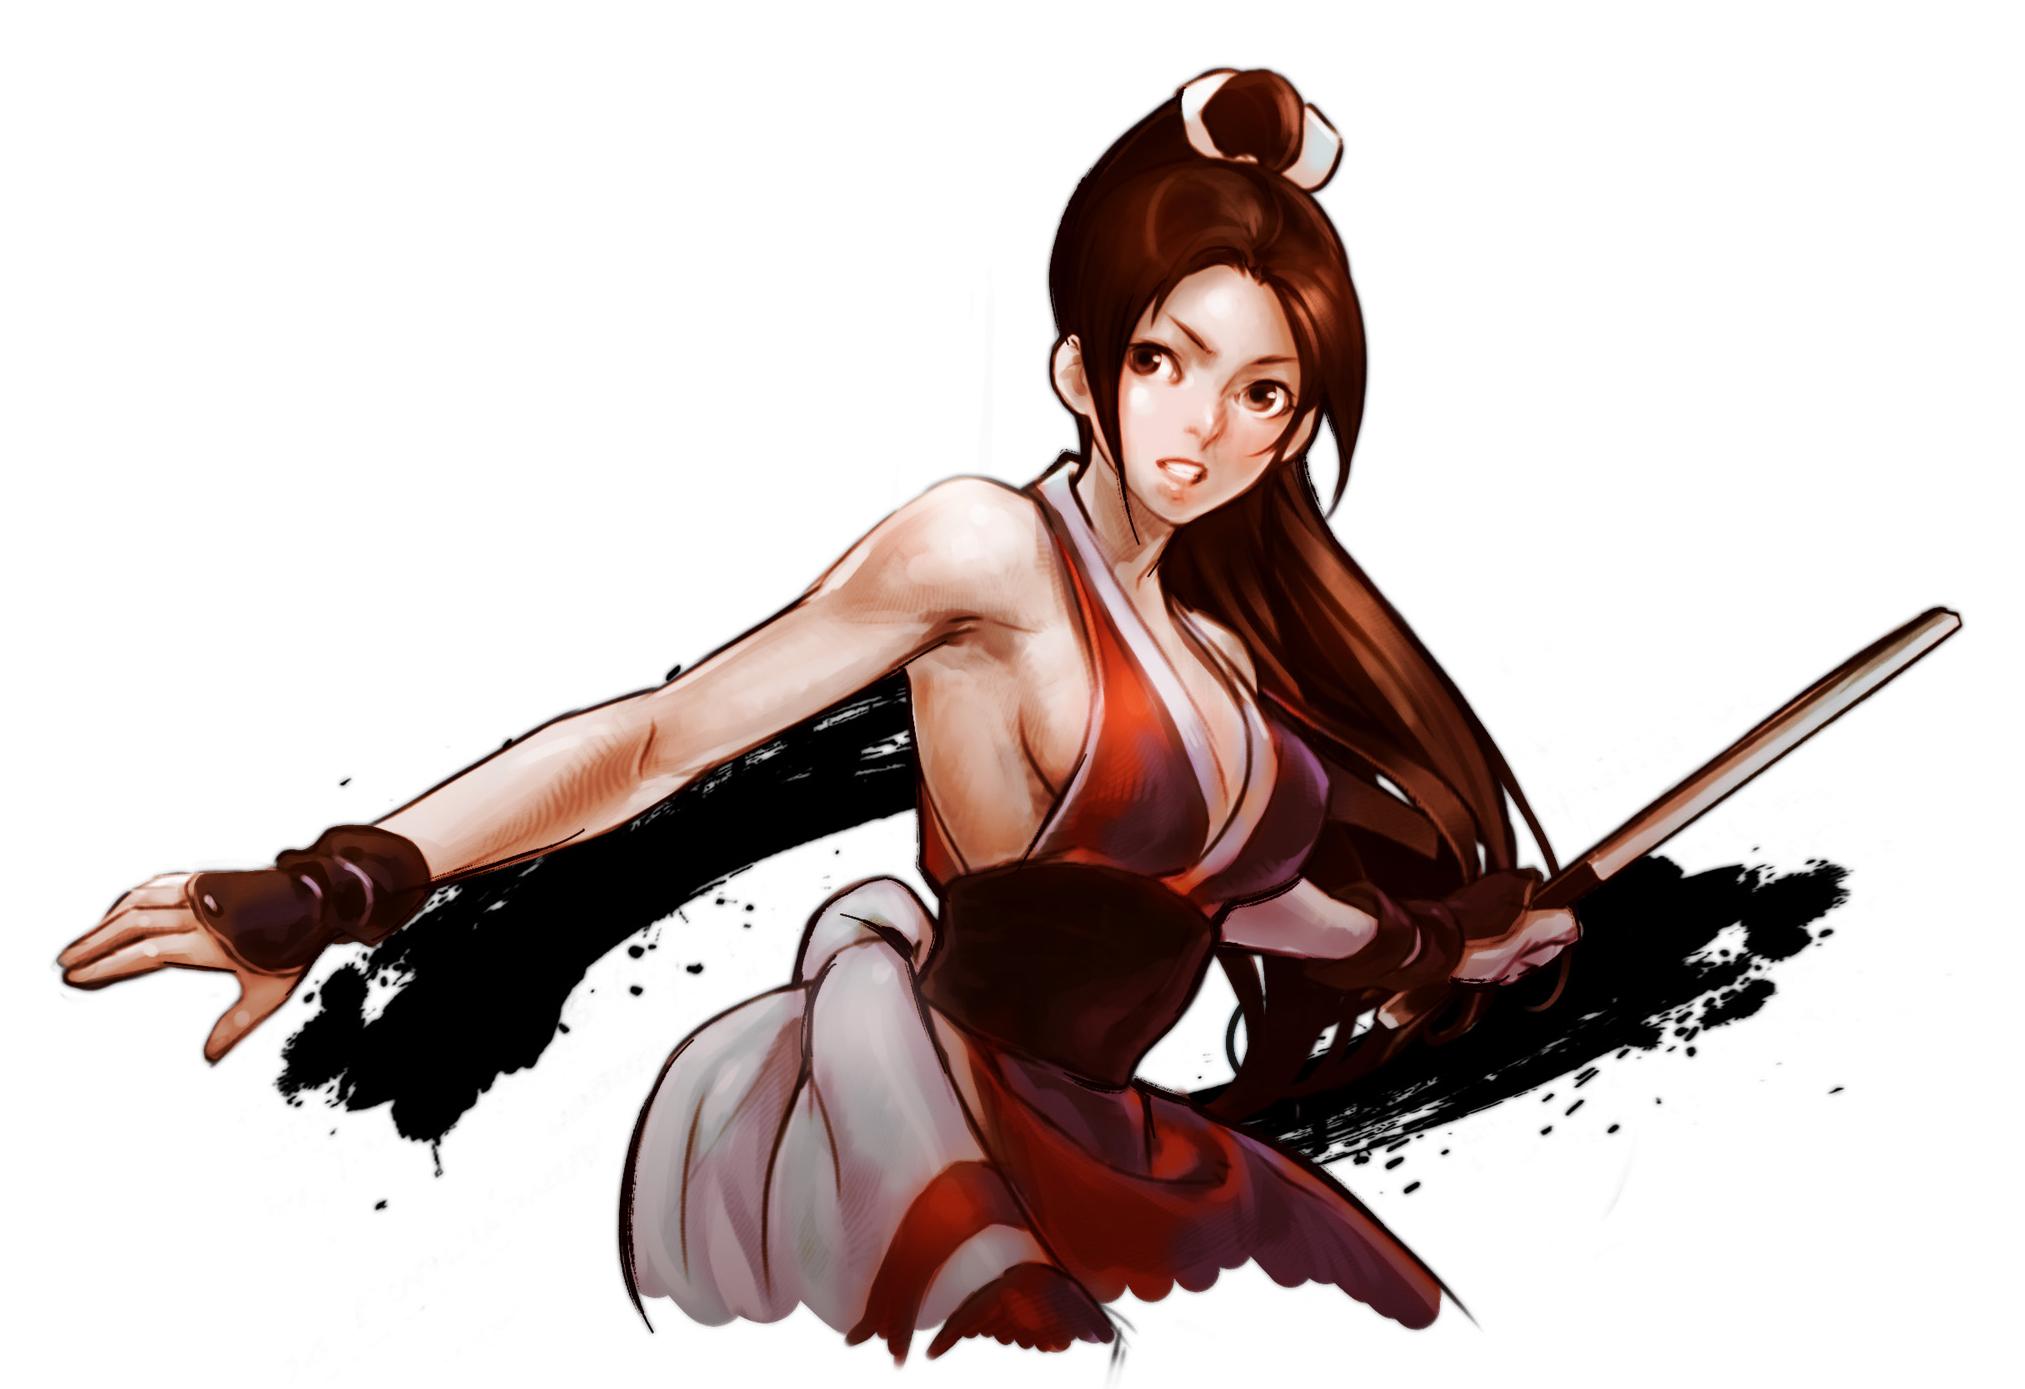 hiroaki yandere 2025x1389